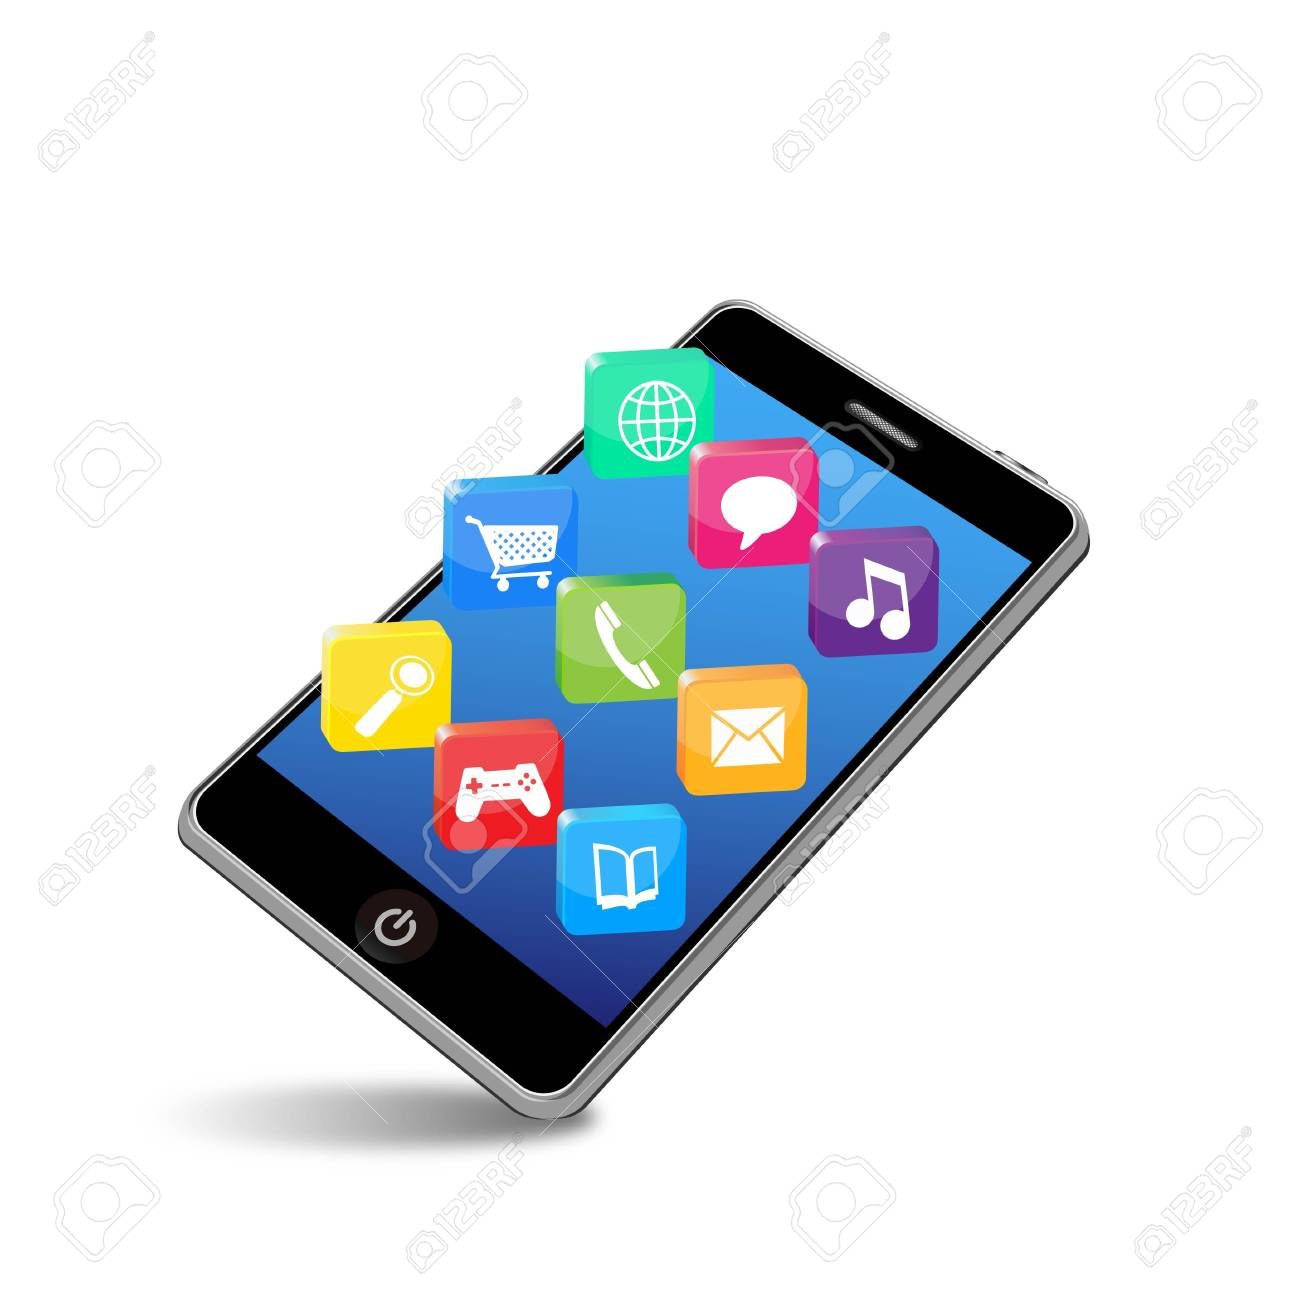 smart phone applications Stock Vector - 11654813